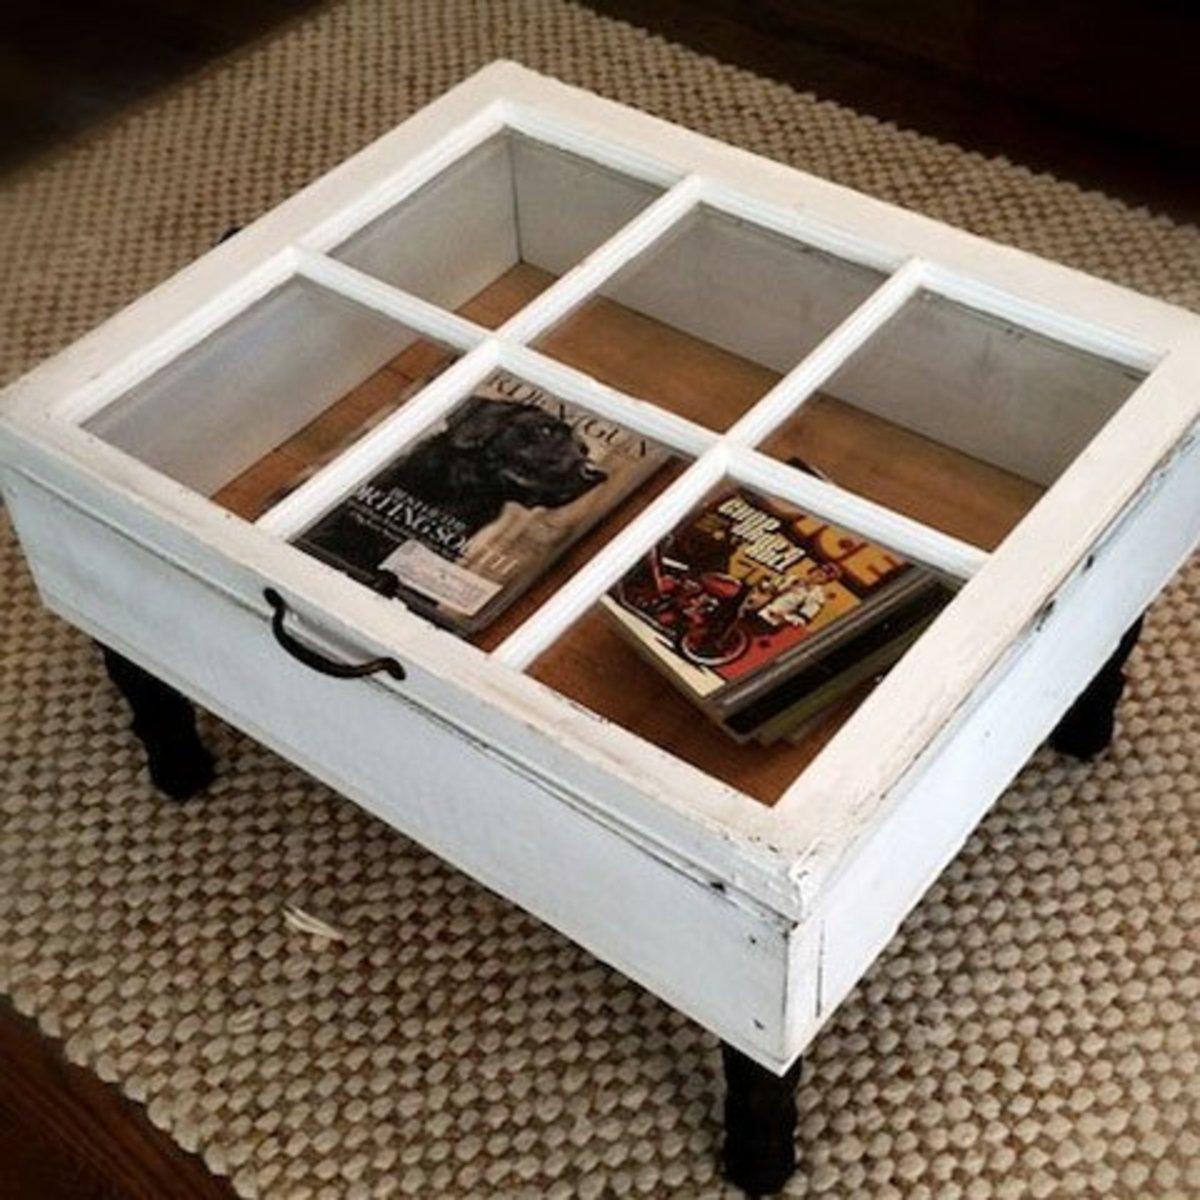 DIY Coffee Table | Easy and Creative Décor Ideas | Click for Tutorial